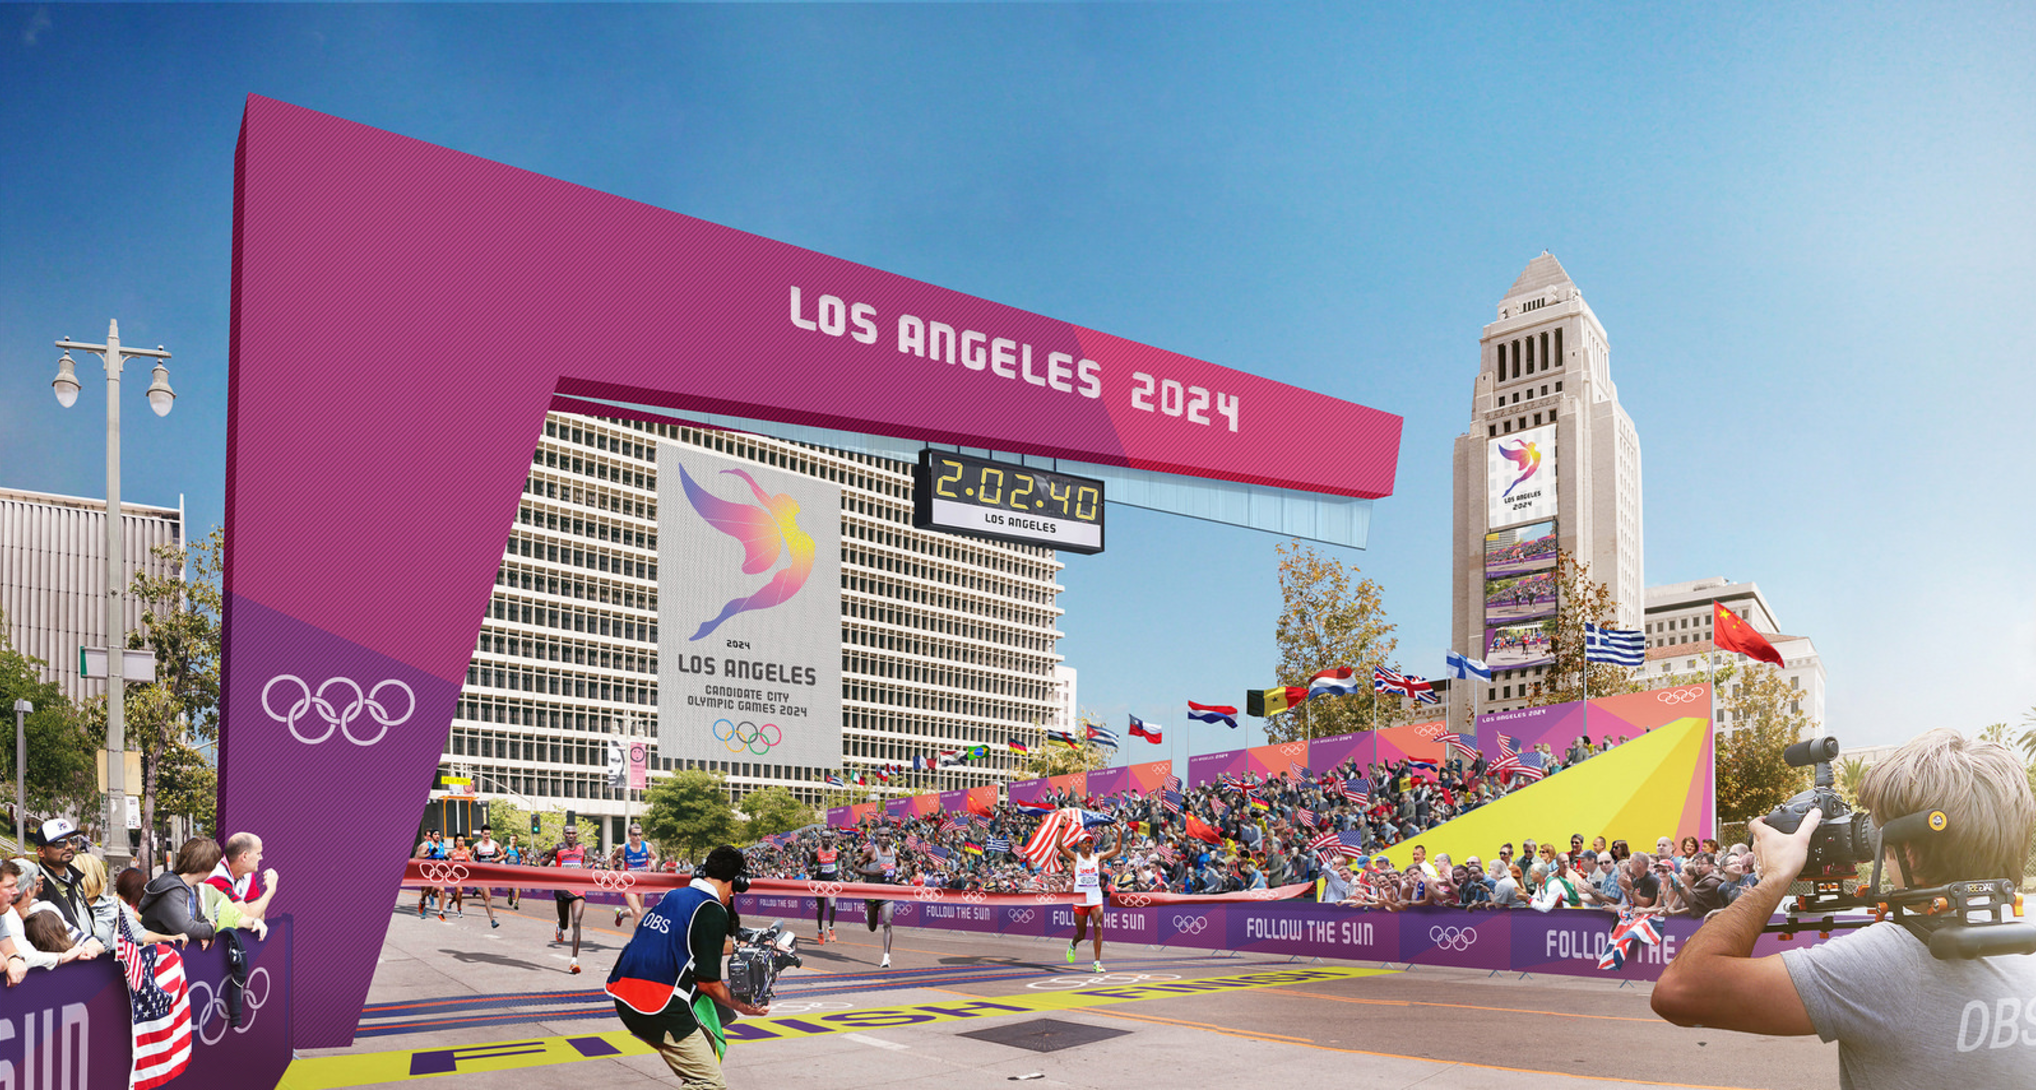 LA 2024 Olympic and Paralympic Bid Process - LA 2024 Marathon Rendering